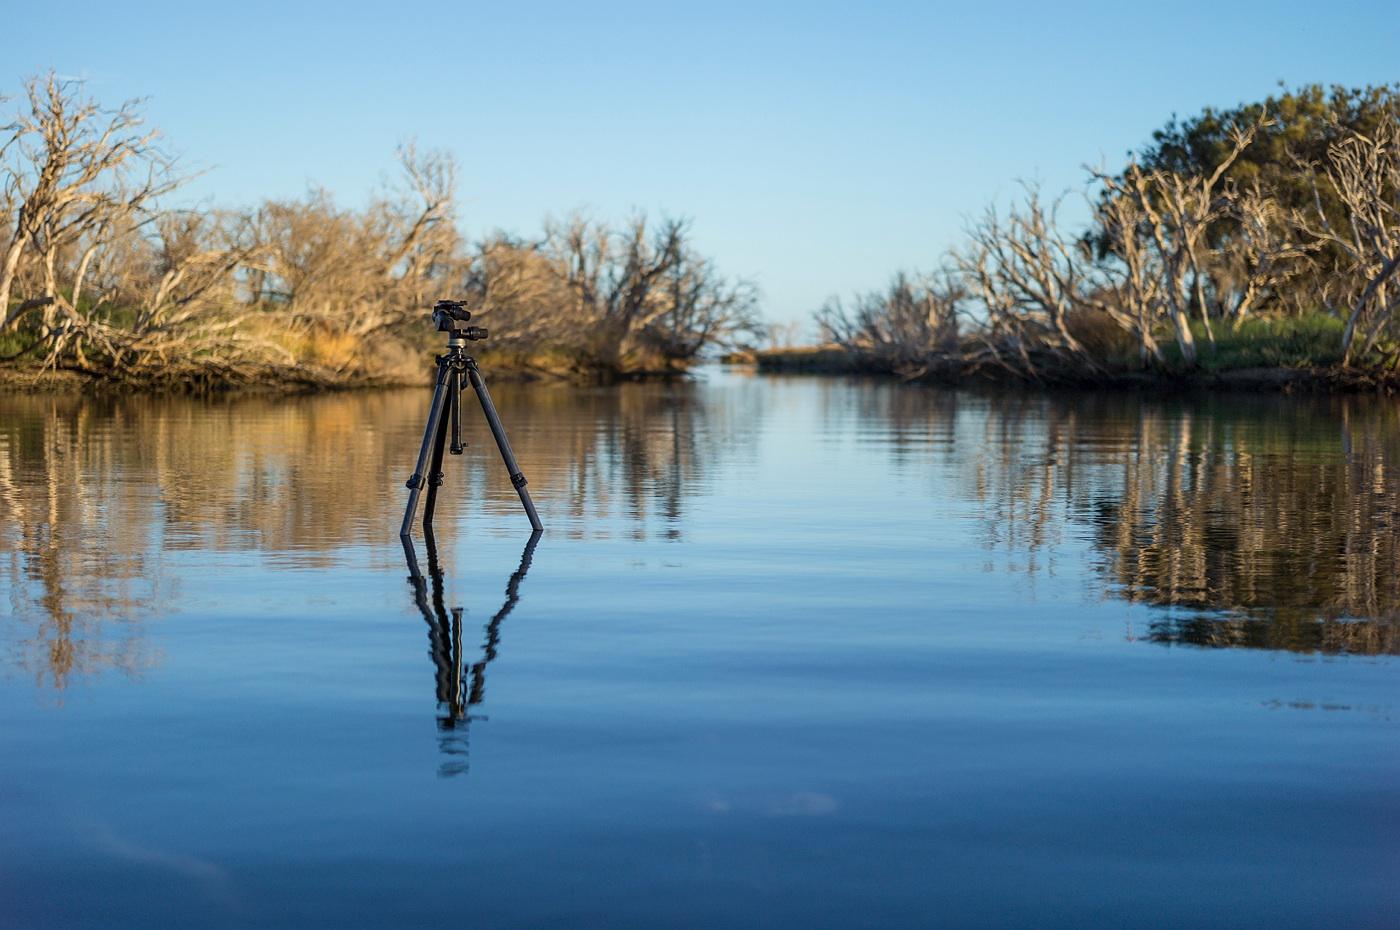 harvey_river_landscape_photography_13